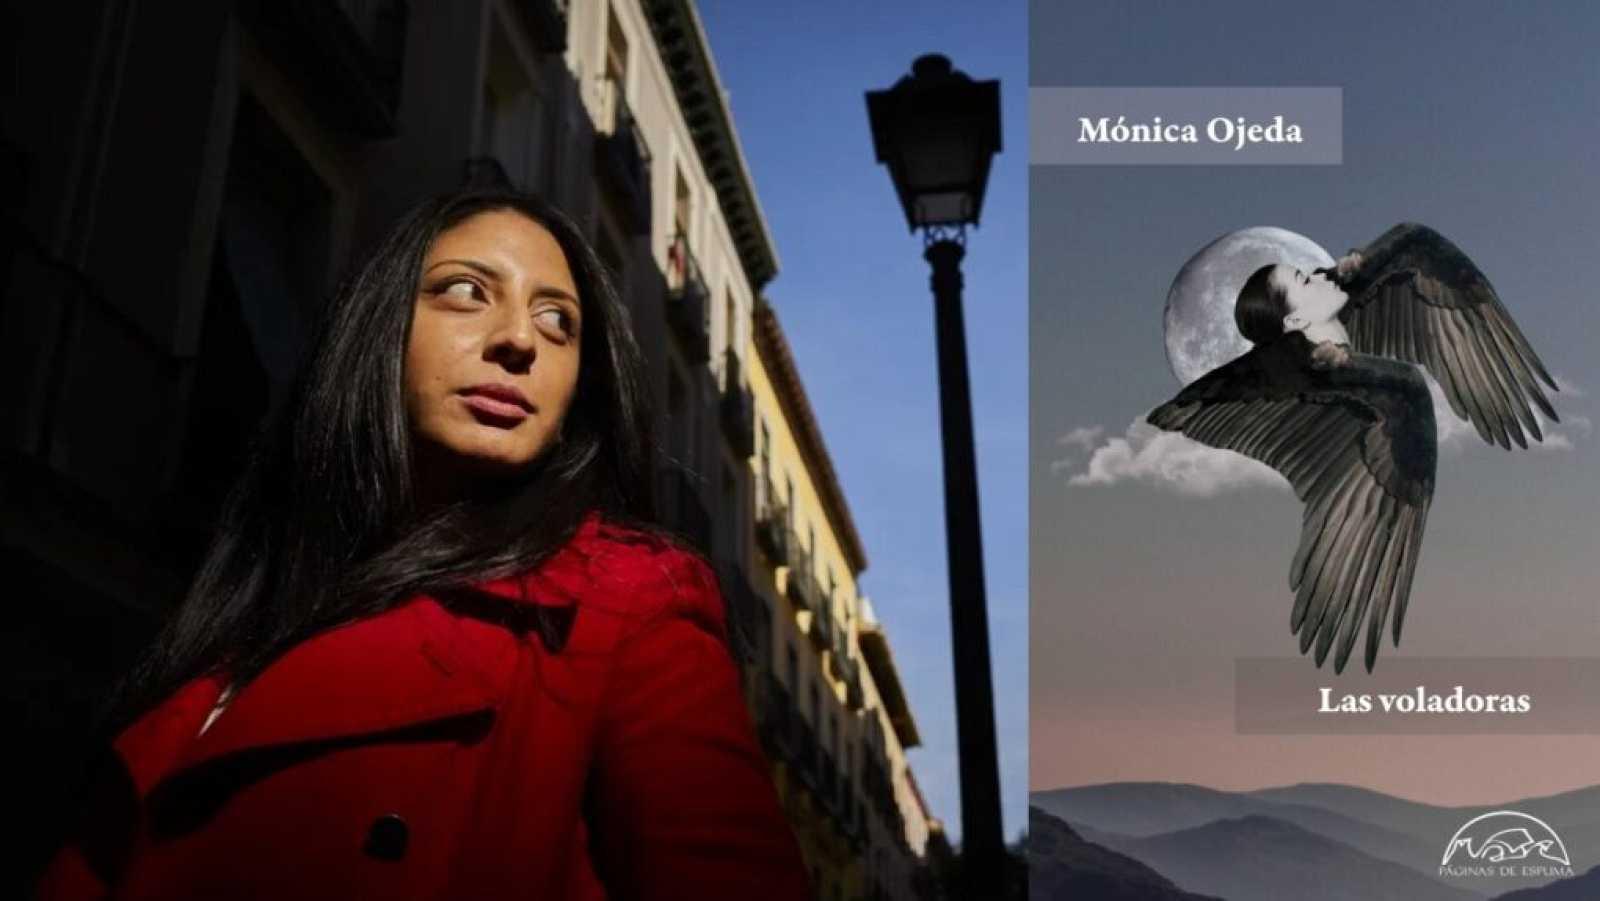 Hora América en R-5 - 'Las voladoras' de Mónica Ojeda - 22/10/20 - Escuchar ahora